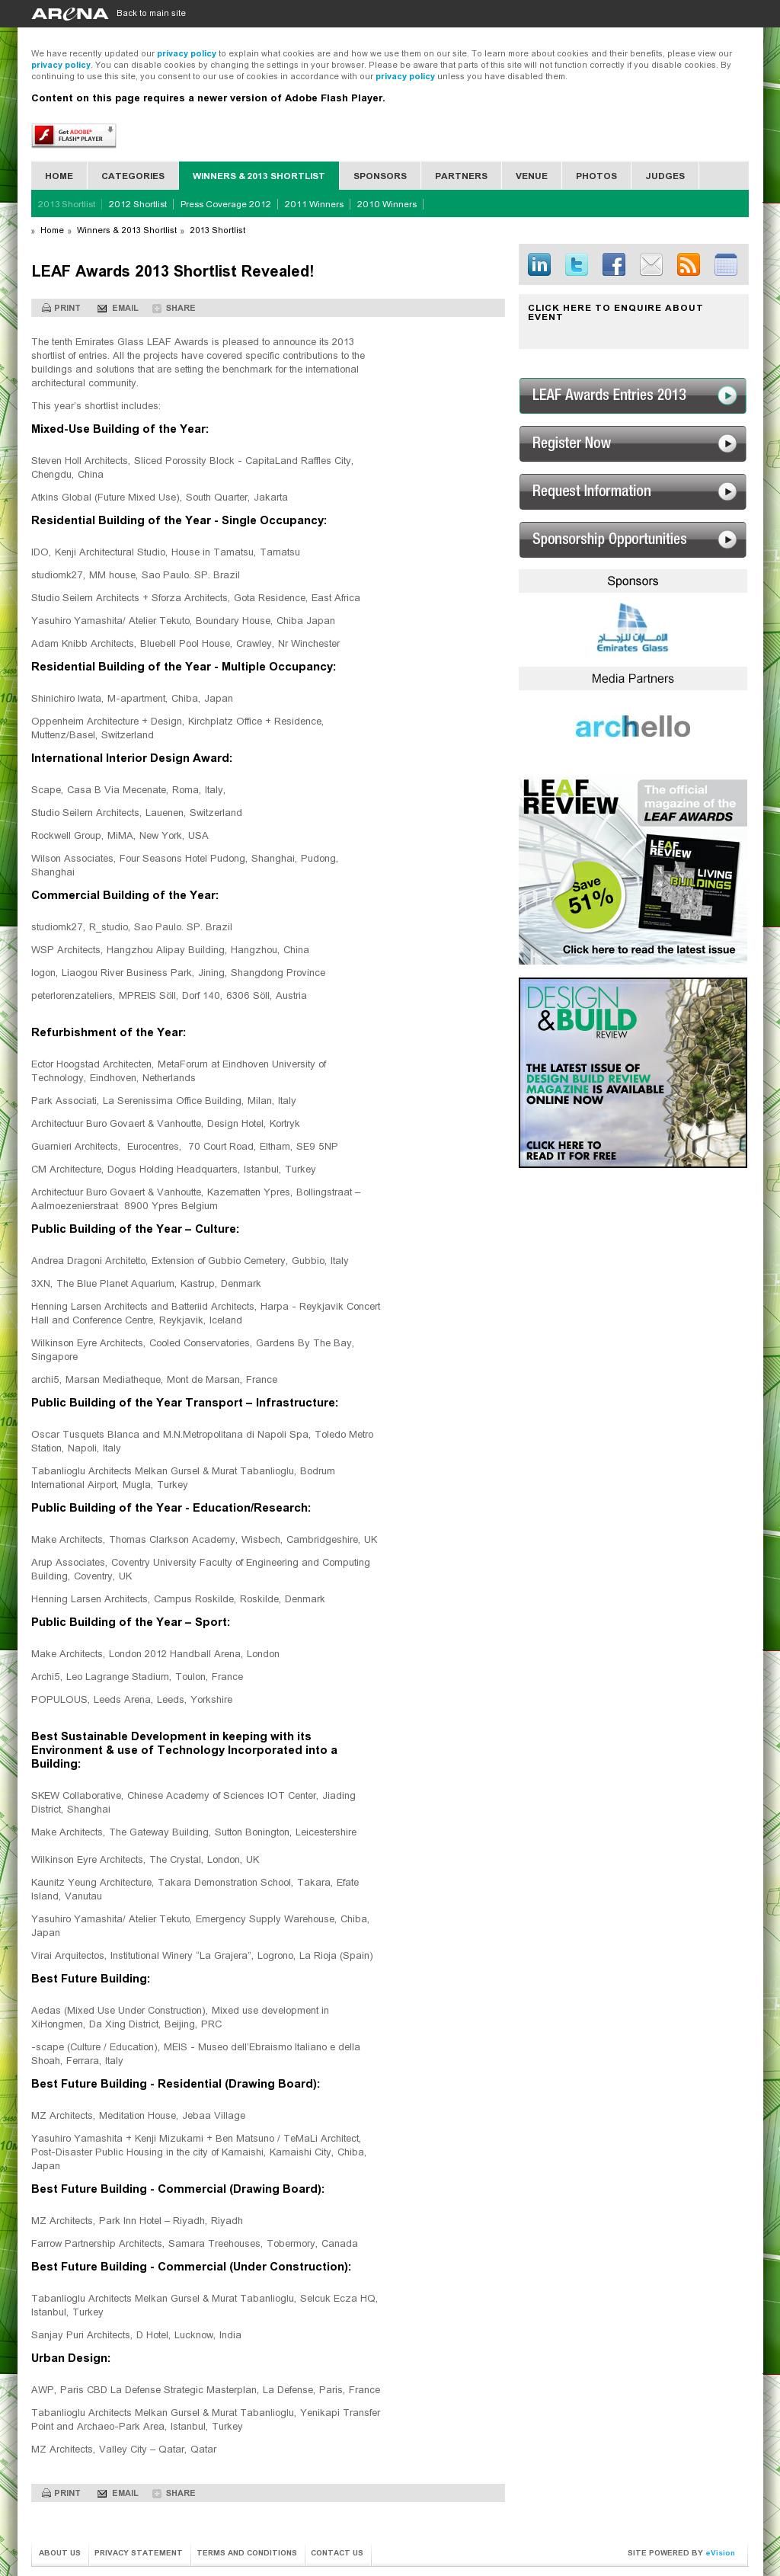 leafawards 2013 shortlist